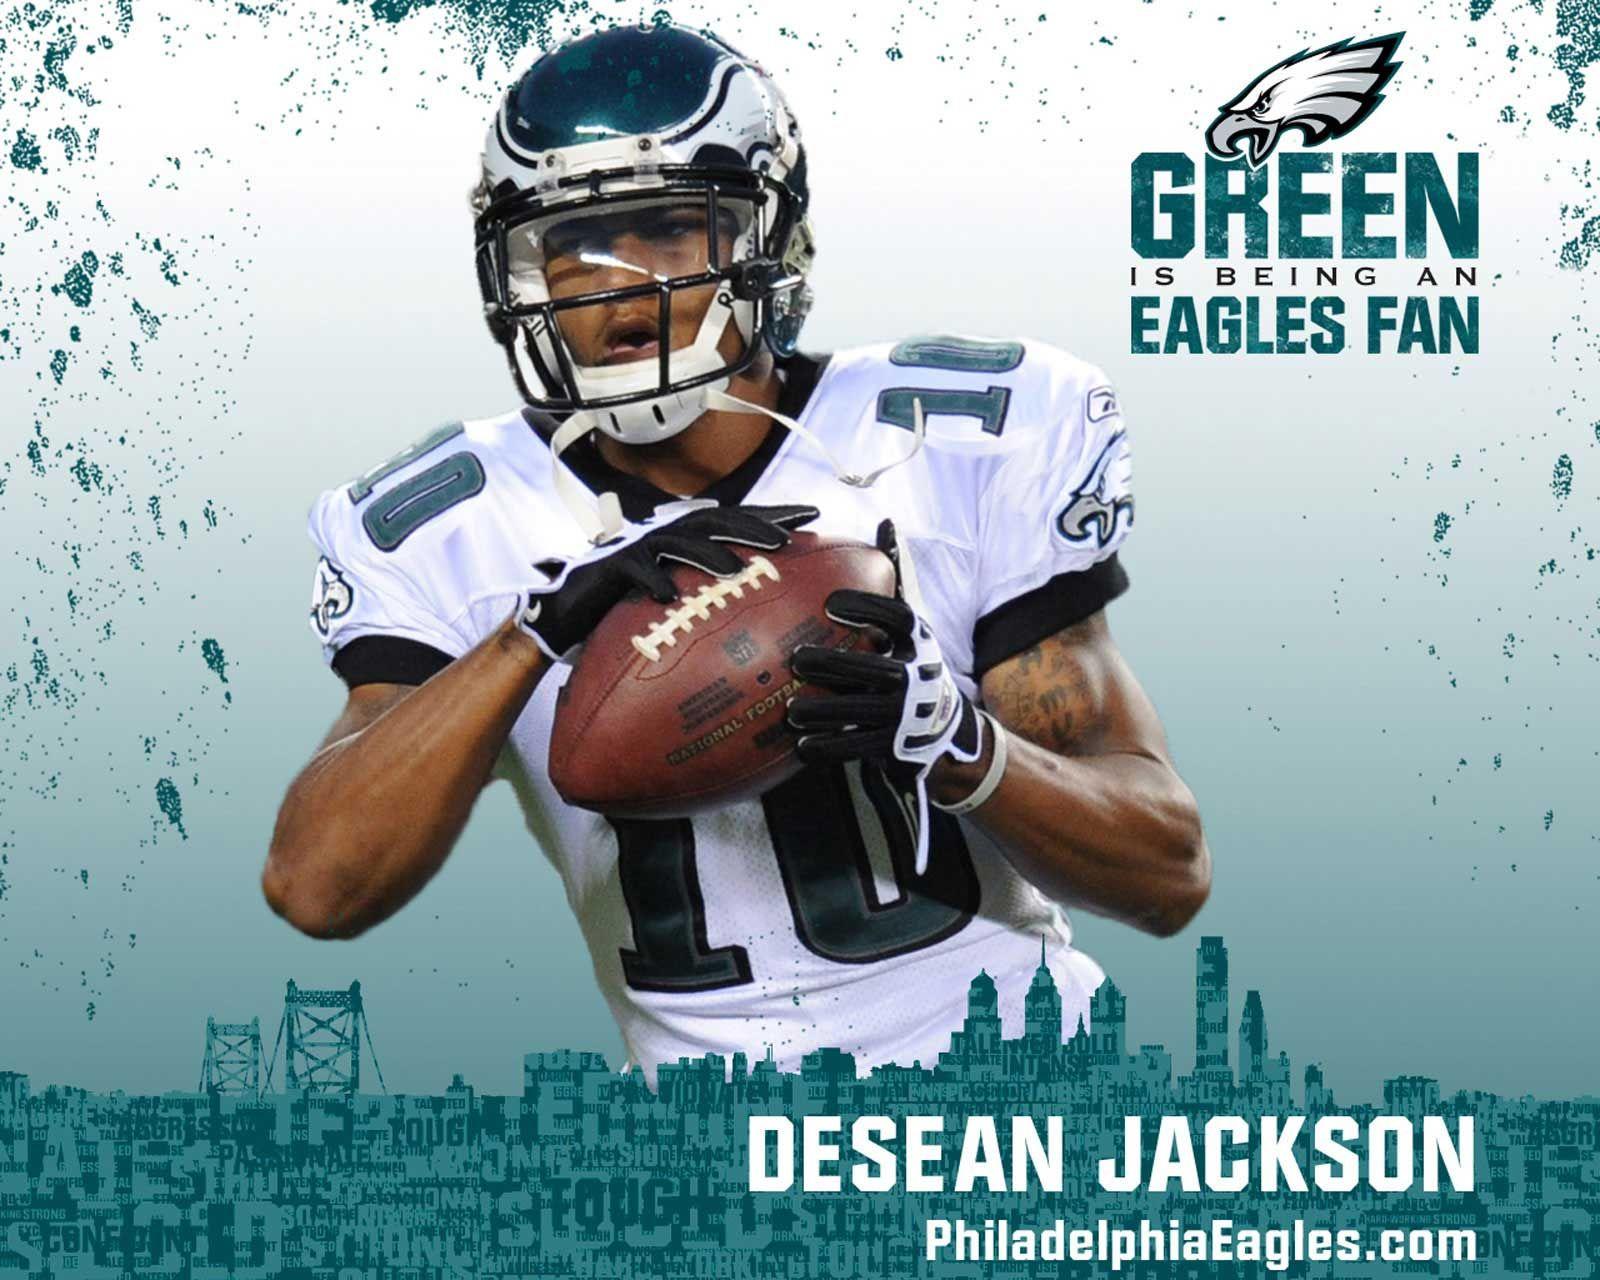 Go Green Desean Jackson Philadelphia Eagles Nfl Philadelphia Eagles